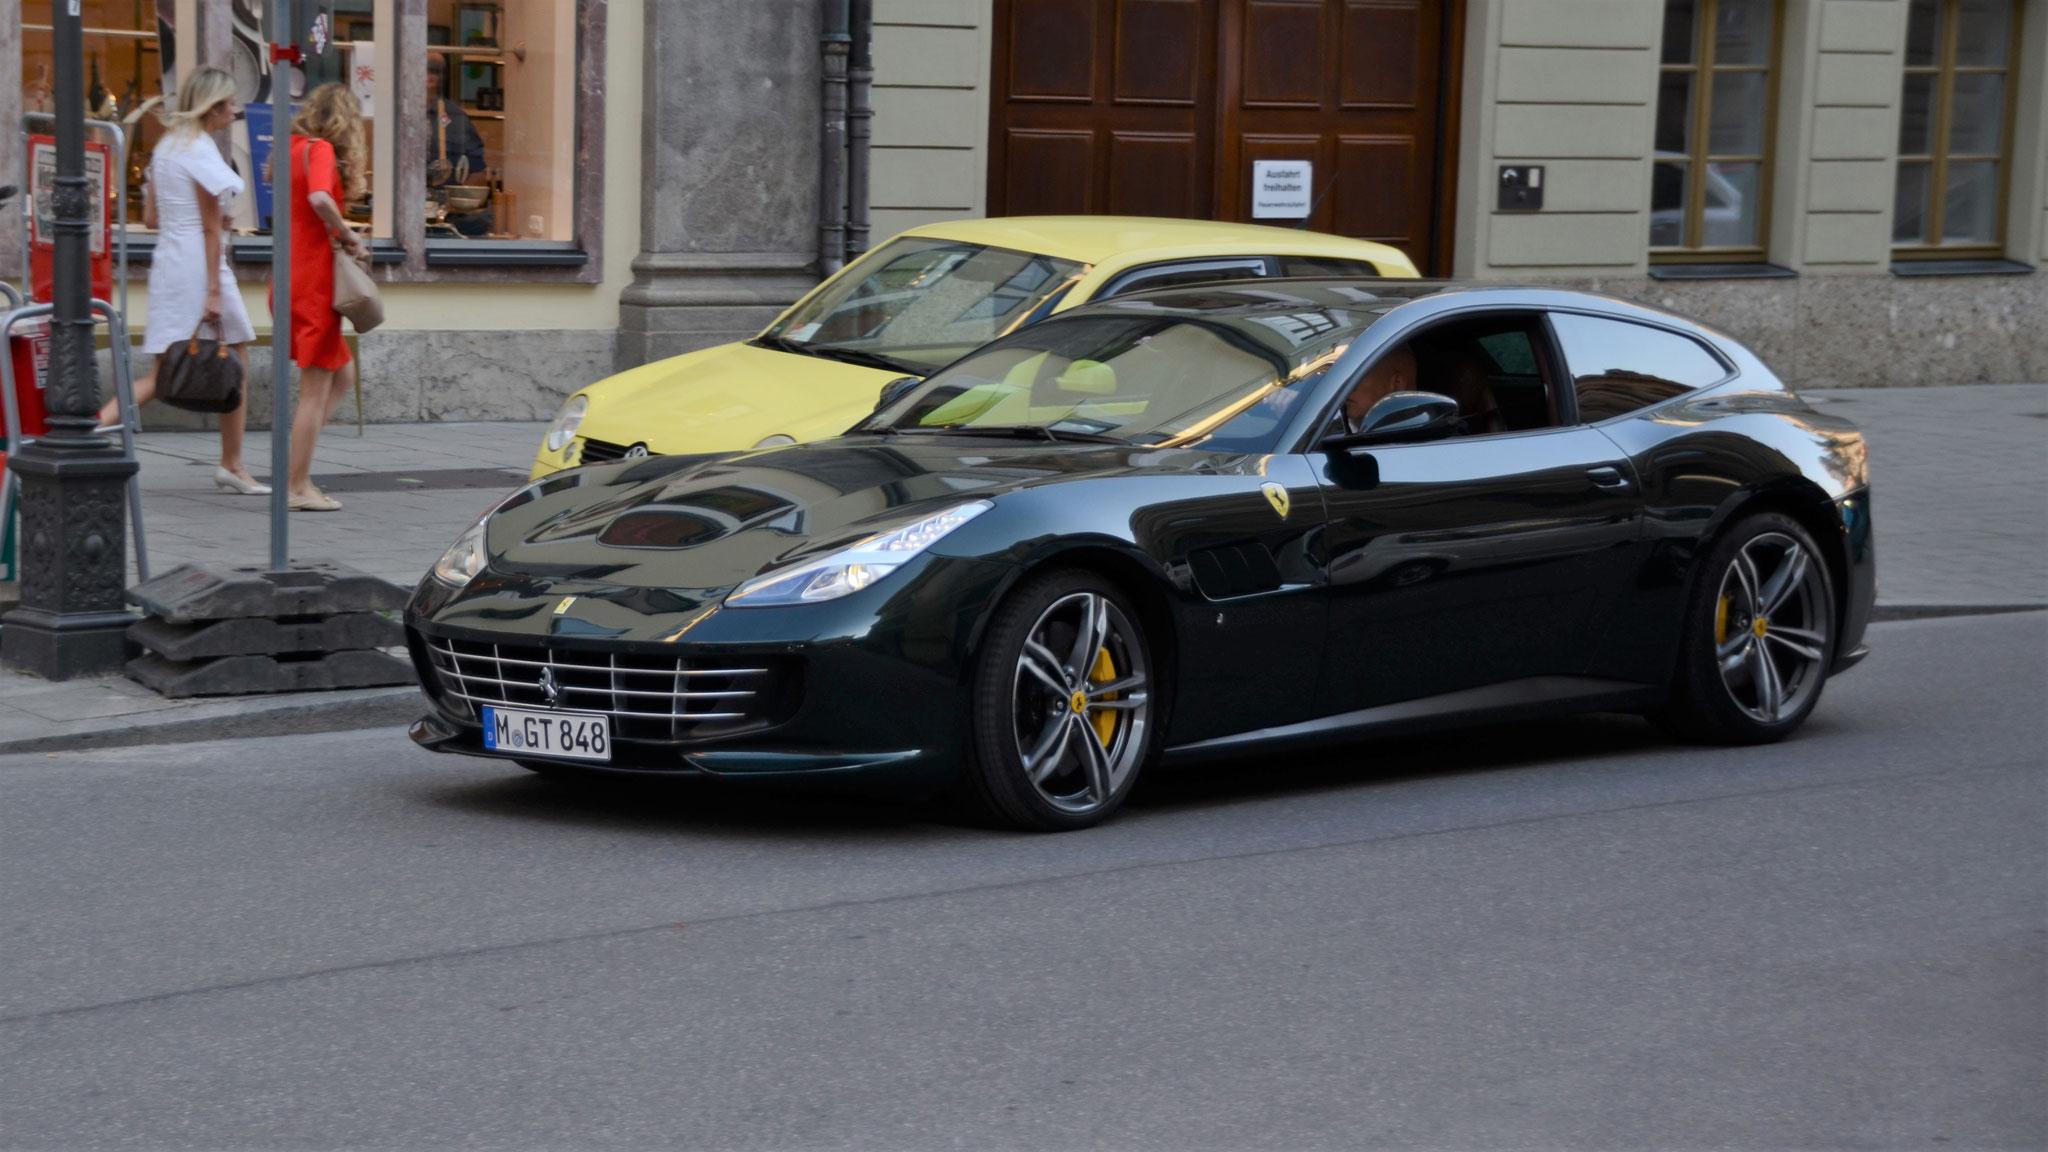 Ferrari GTC4 Lusso - M-GT-848